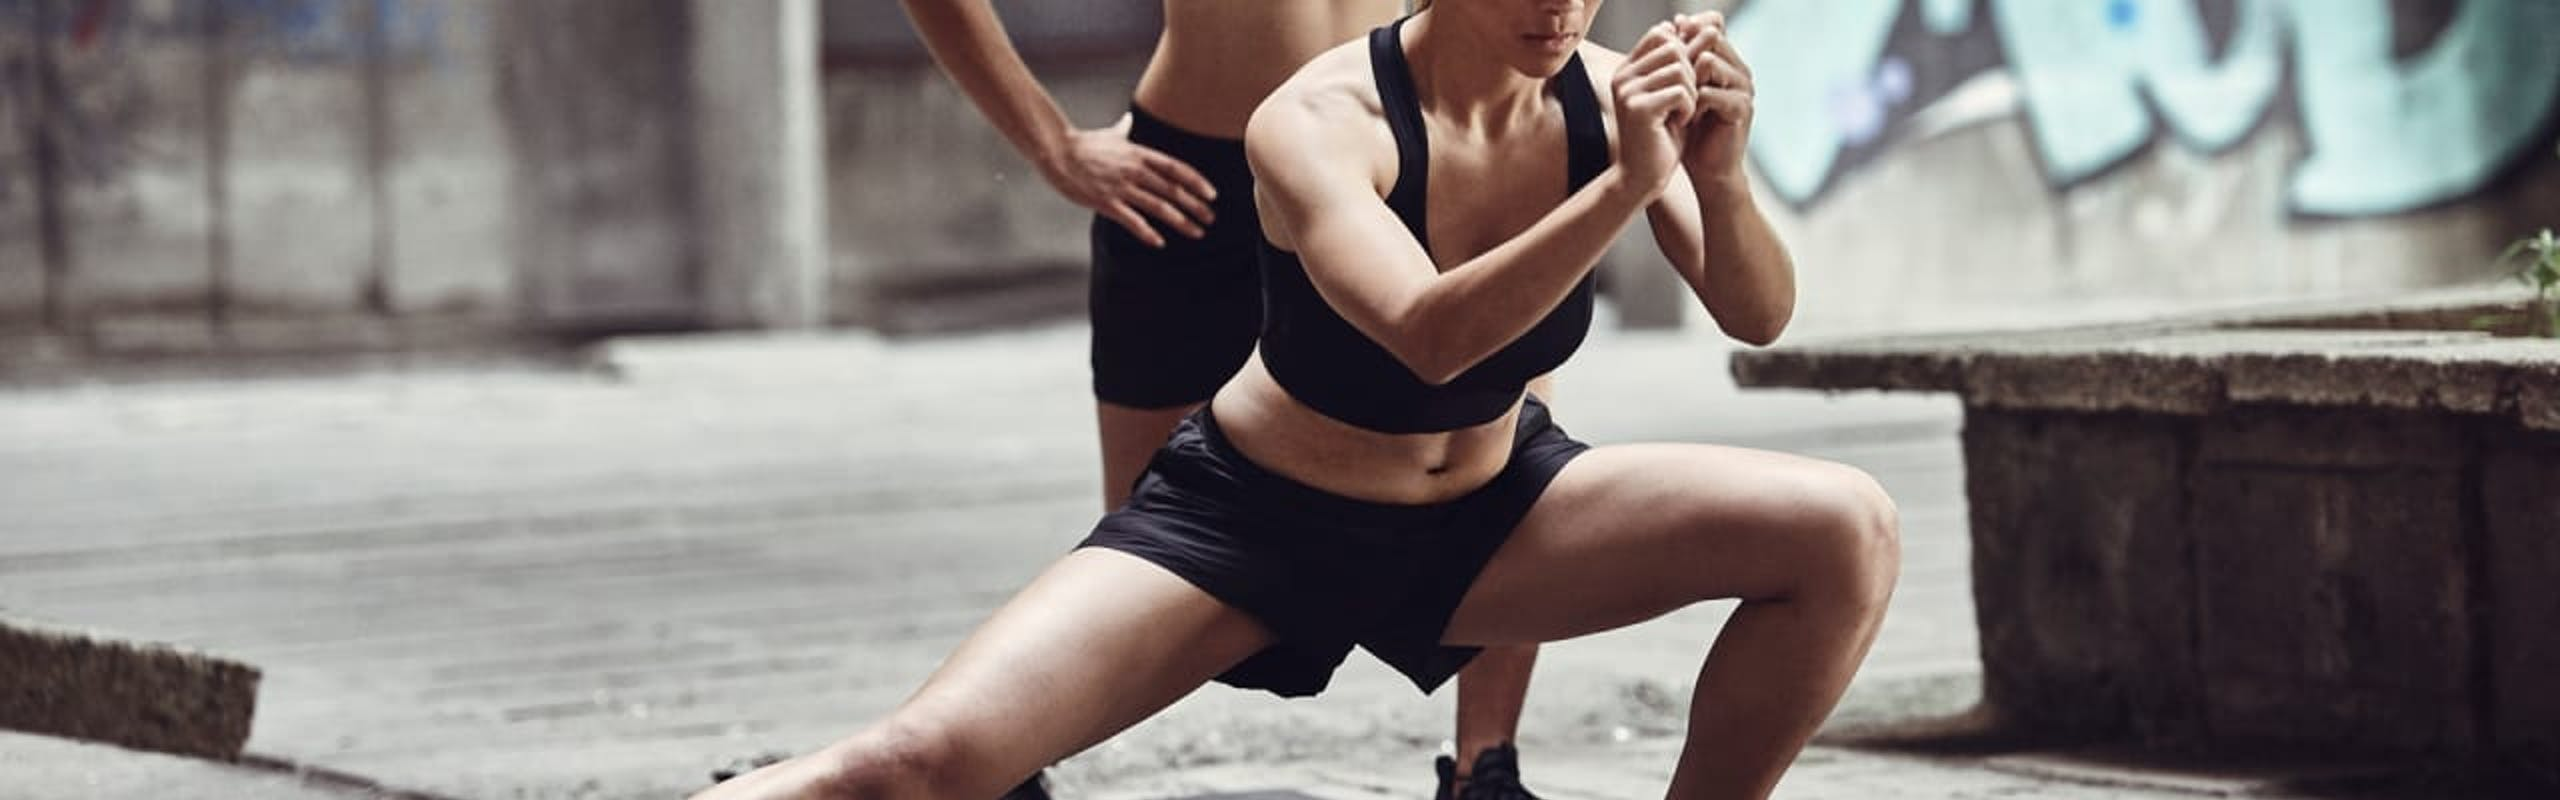 Freeletics: una nuova fitness app